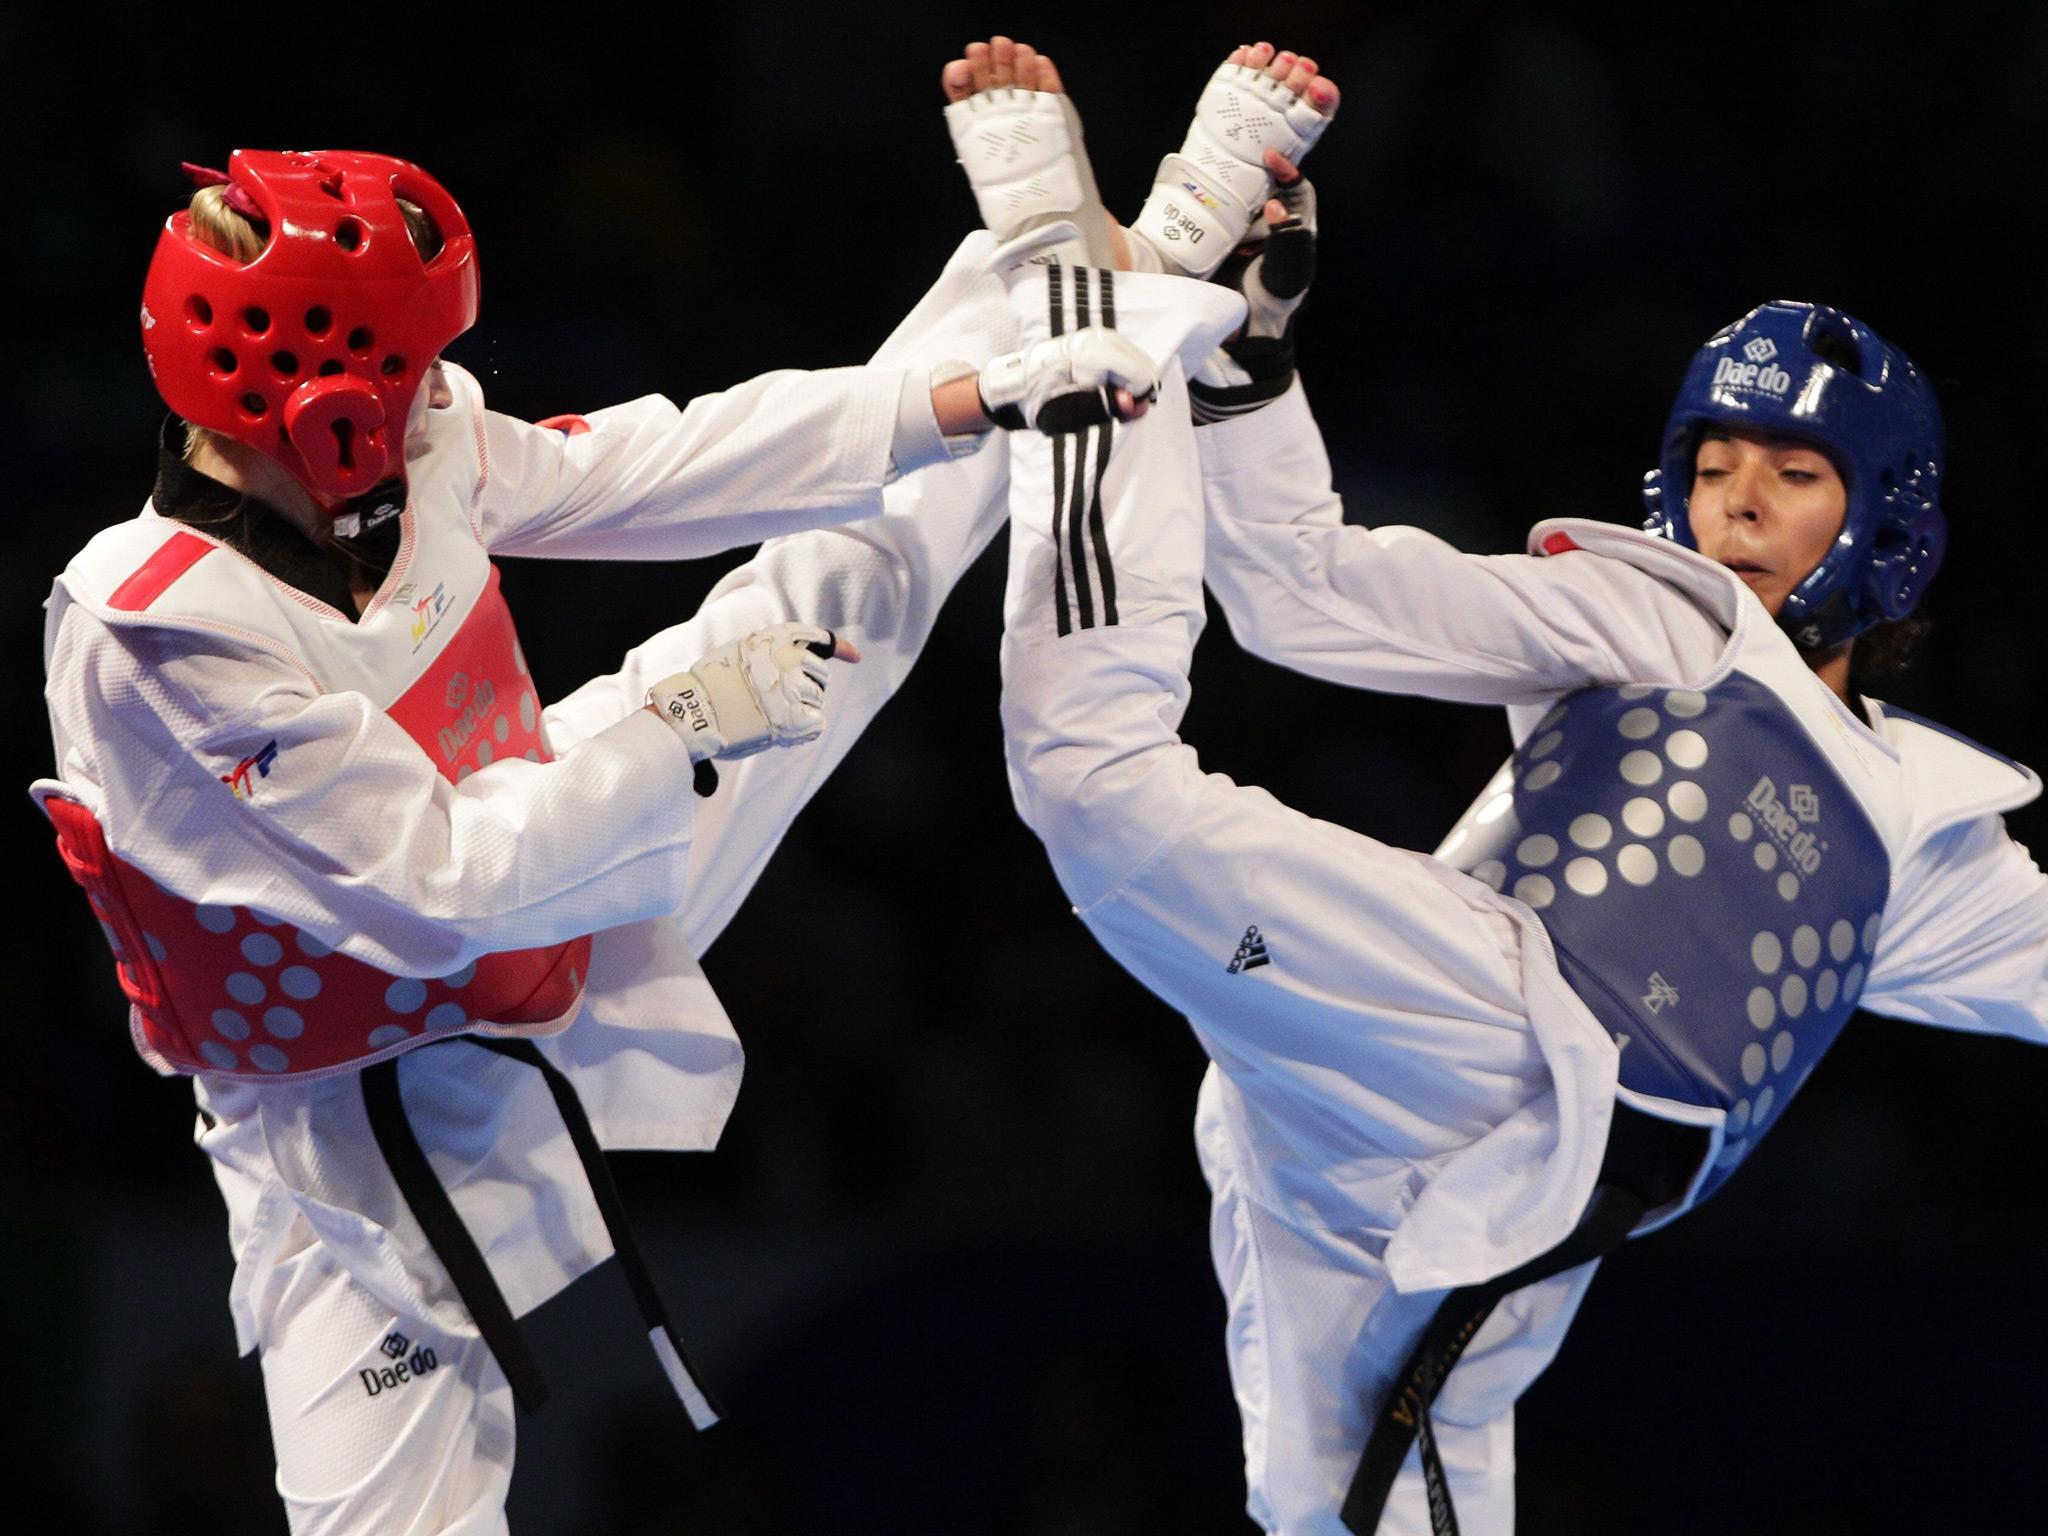 Taekwondo Sparring Wallpaper Taekwondo world tournamen 014 2048x1536